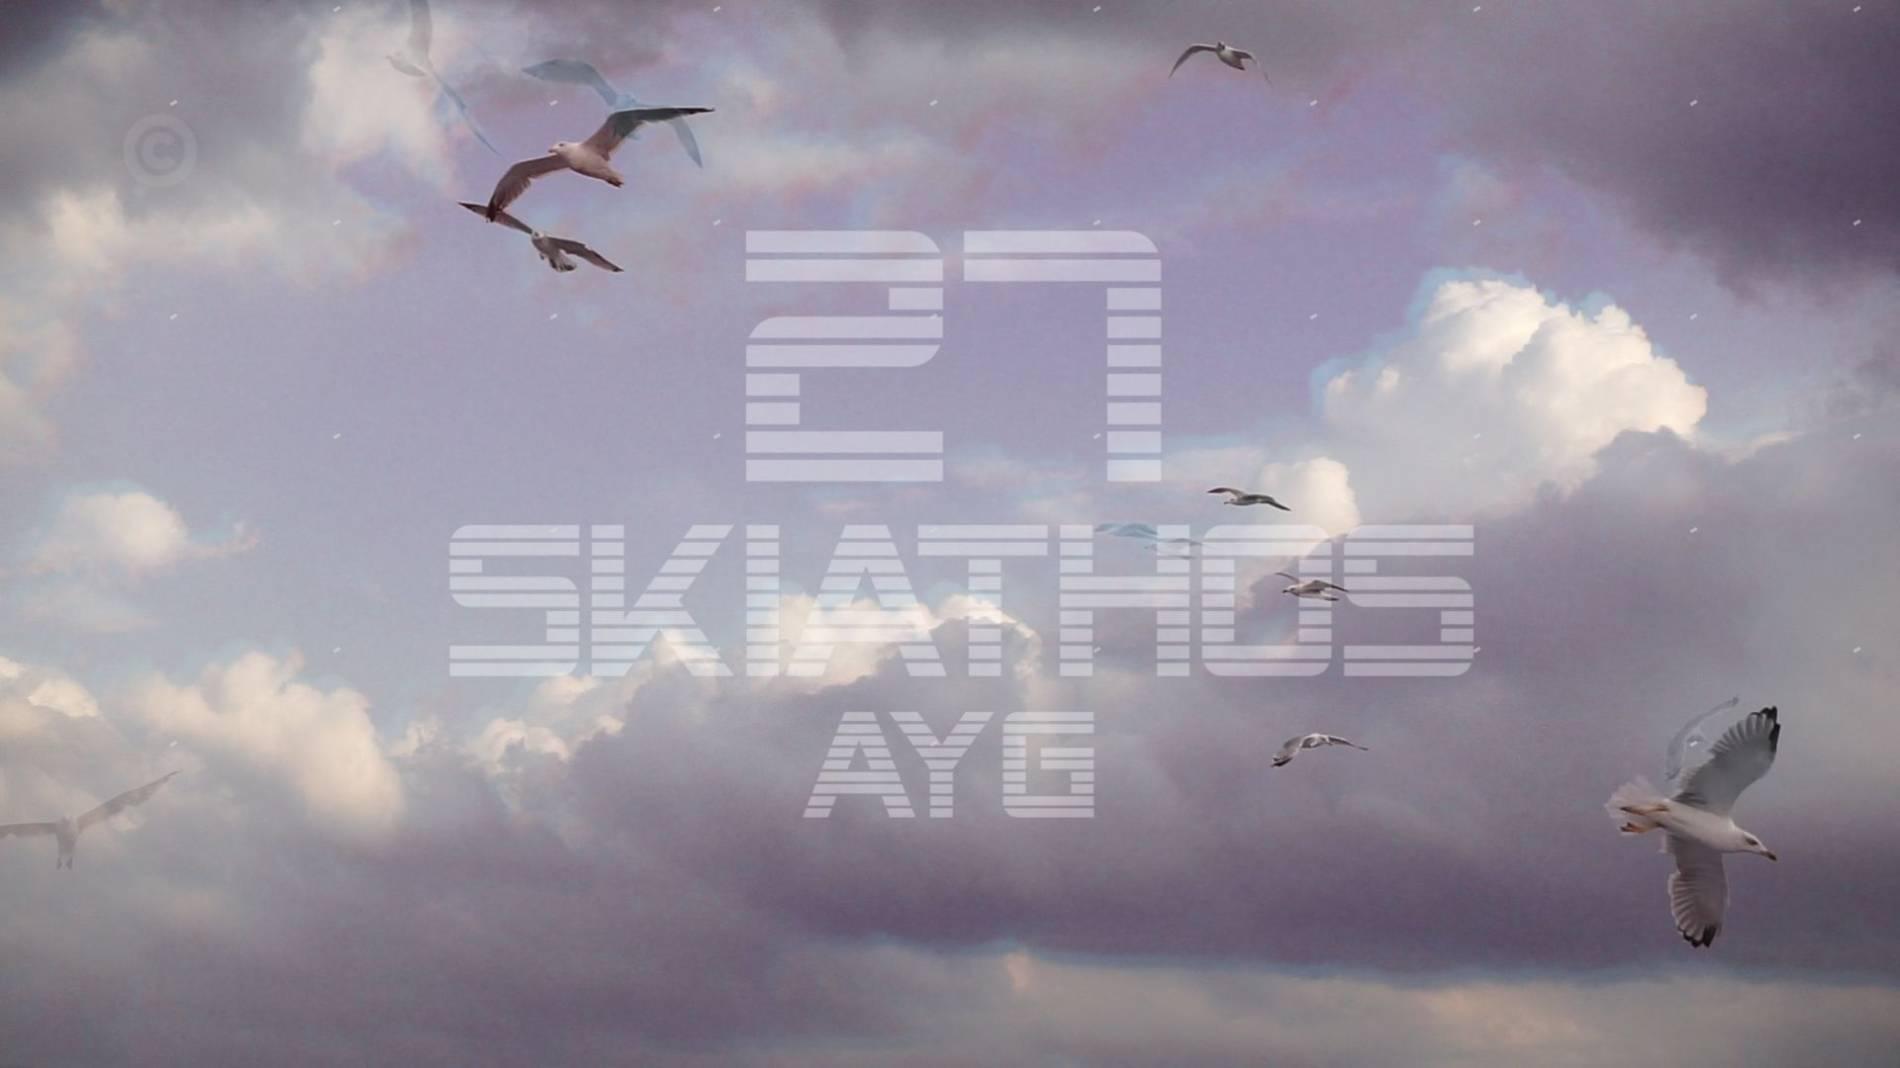 skiathos video cover